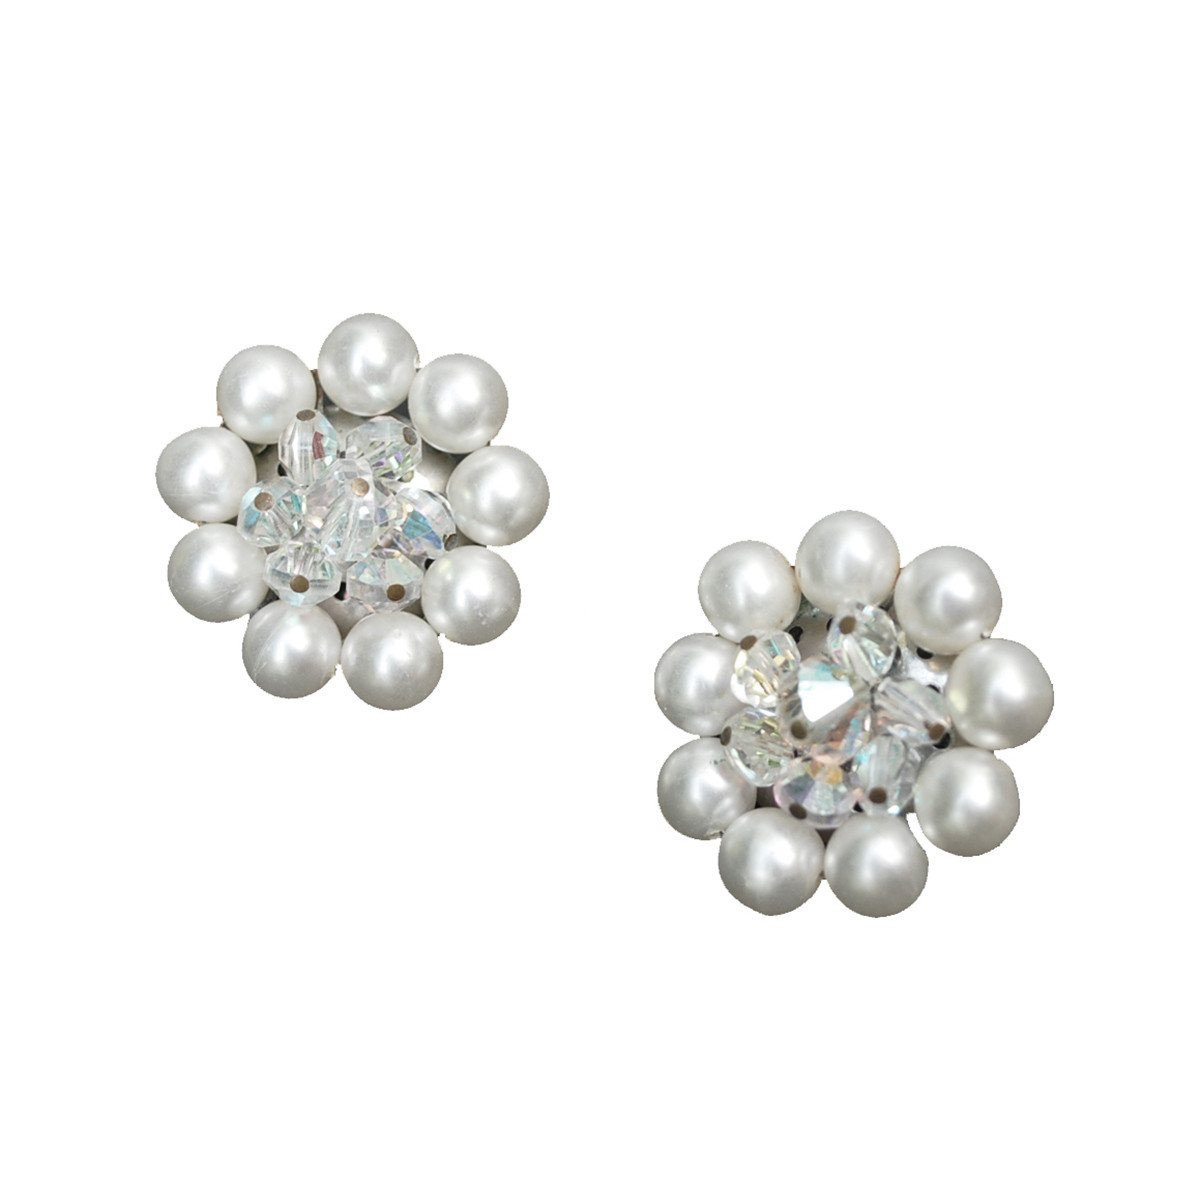 Mid Century Faux Pearl Earrings, Aurora Borealis Bead Centers